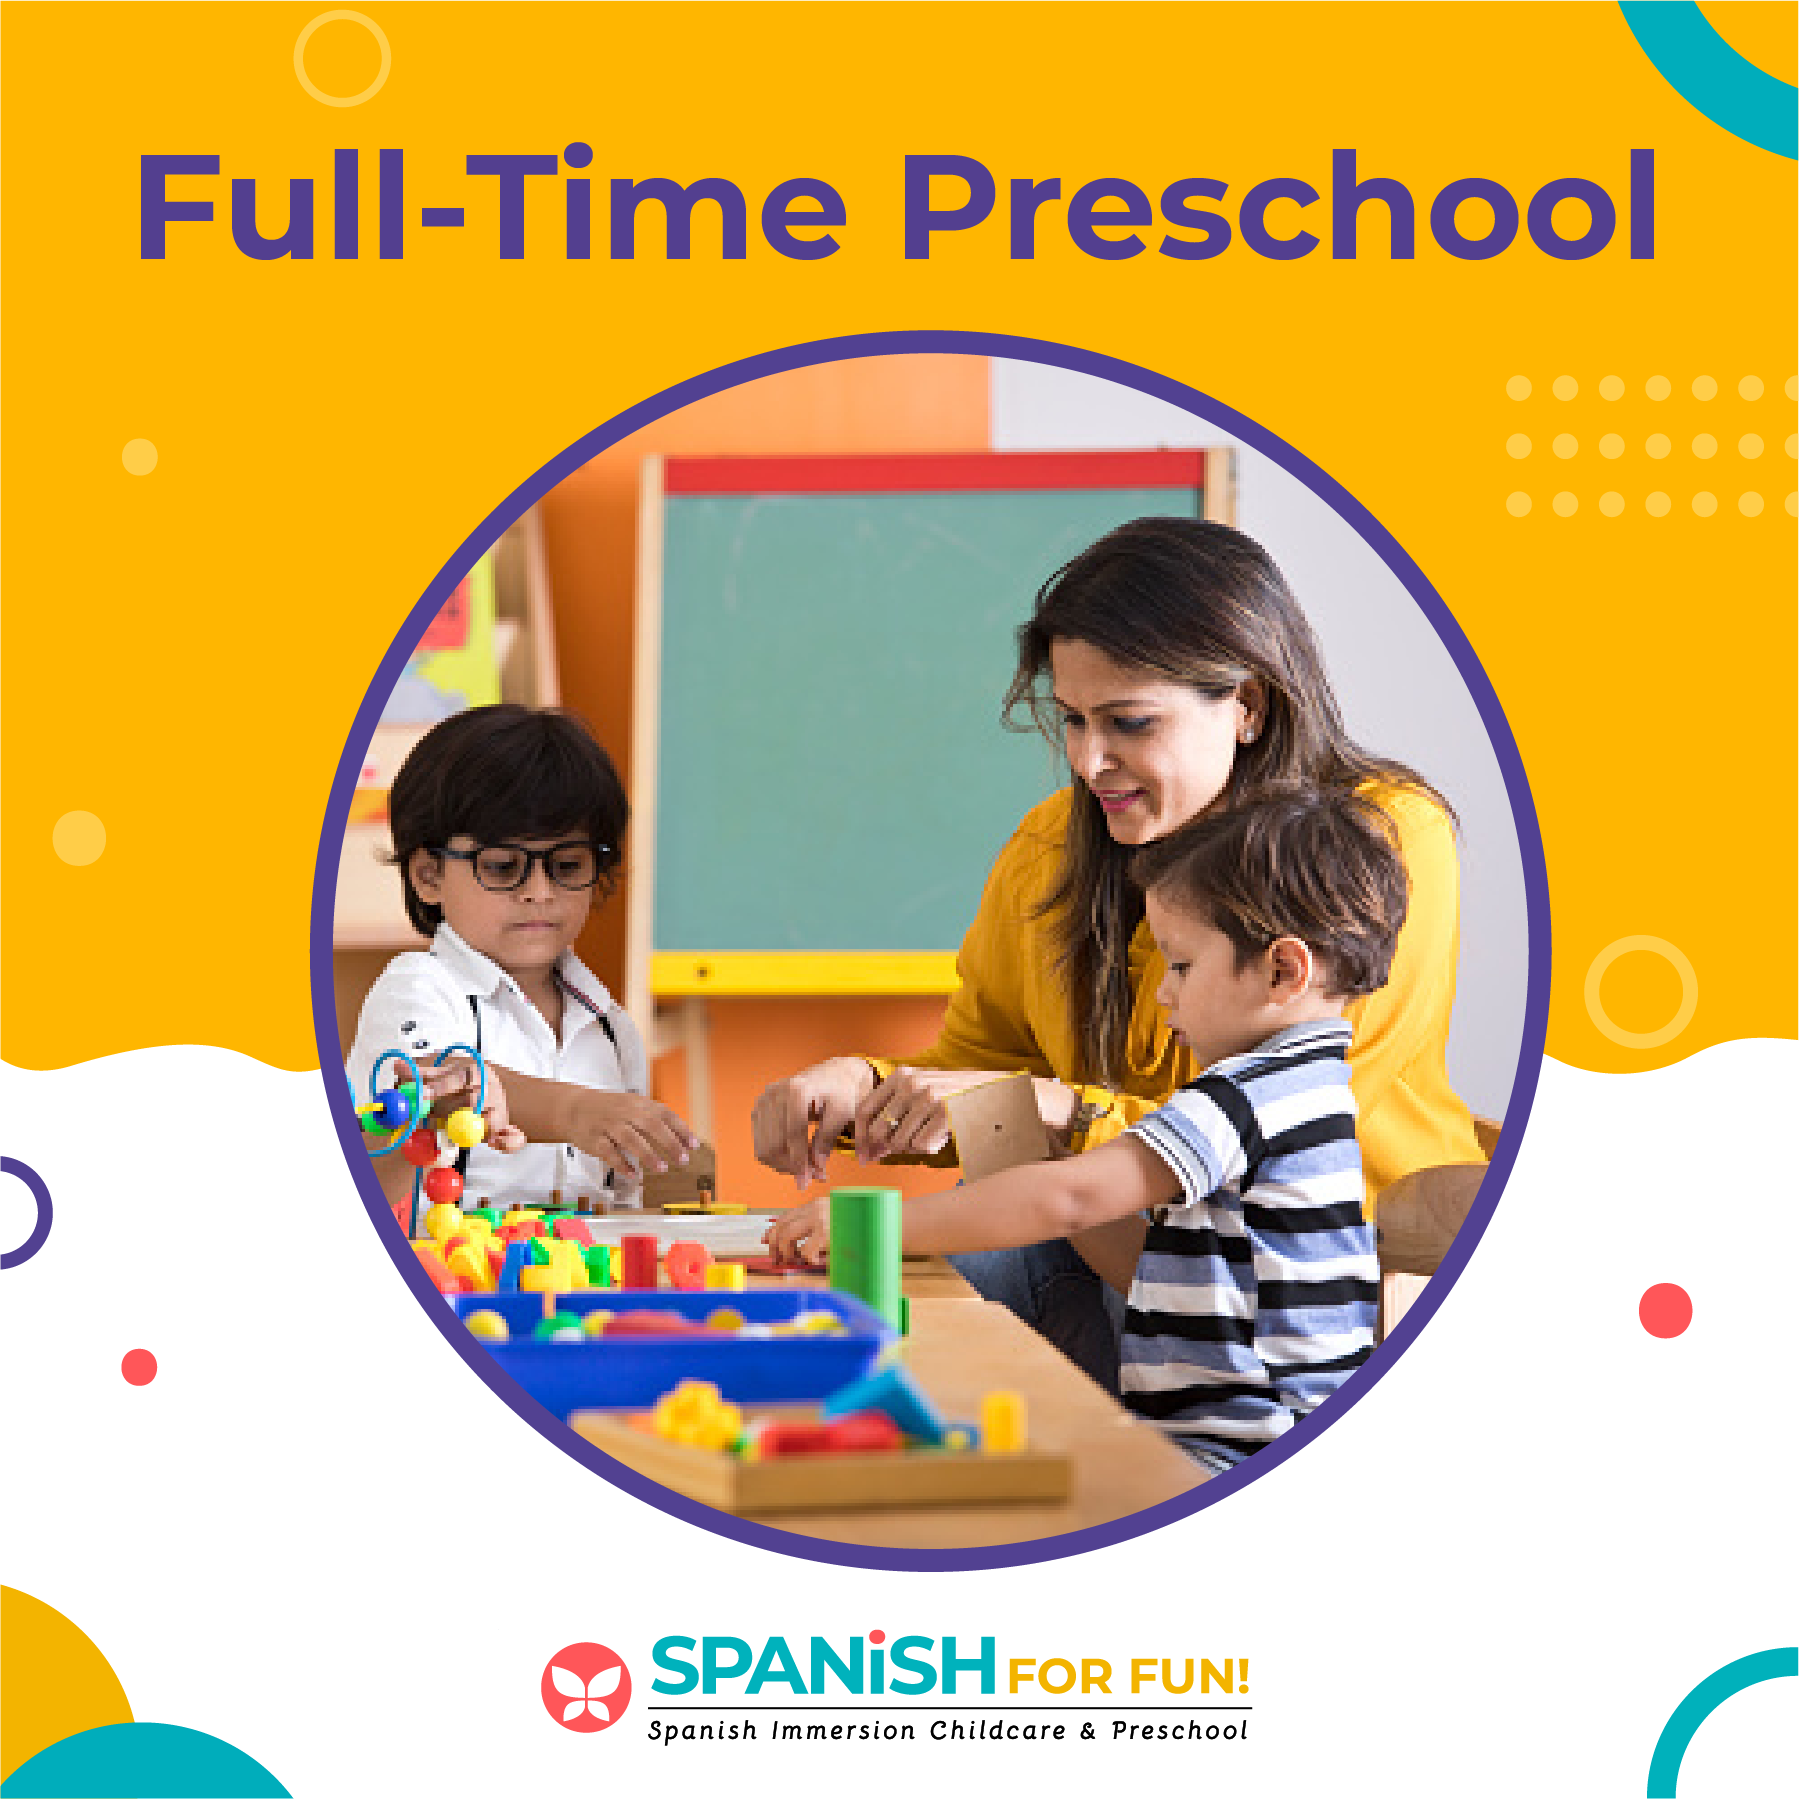 Full time preschool